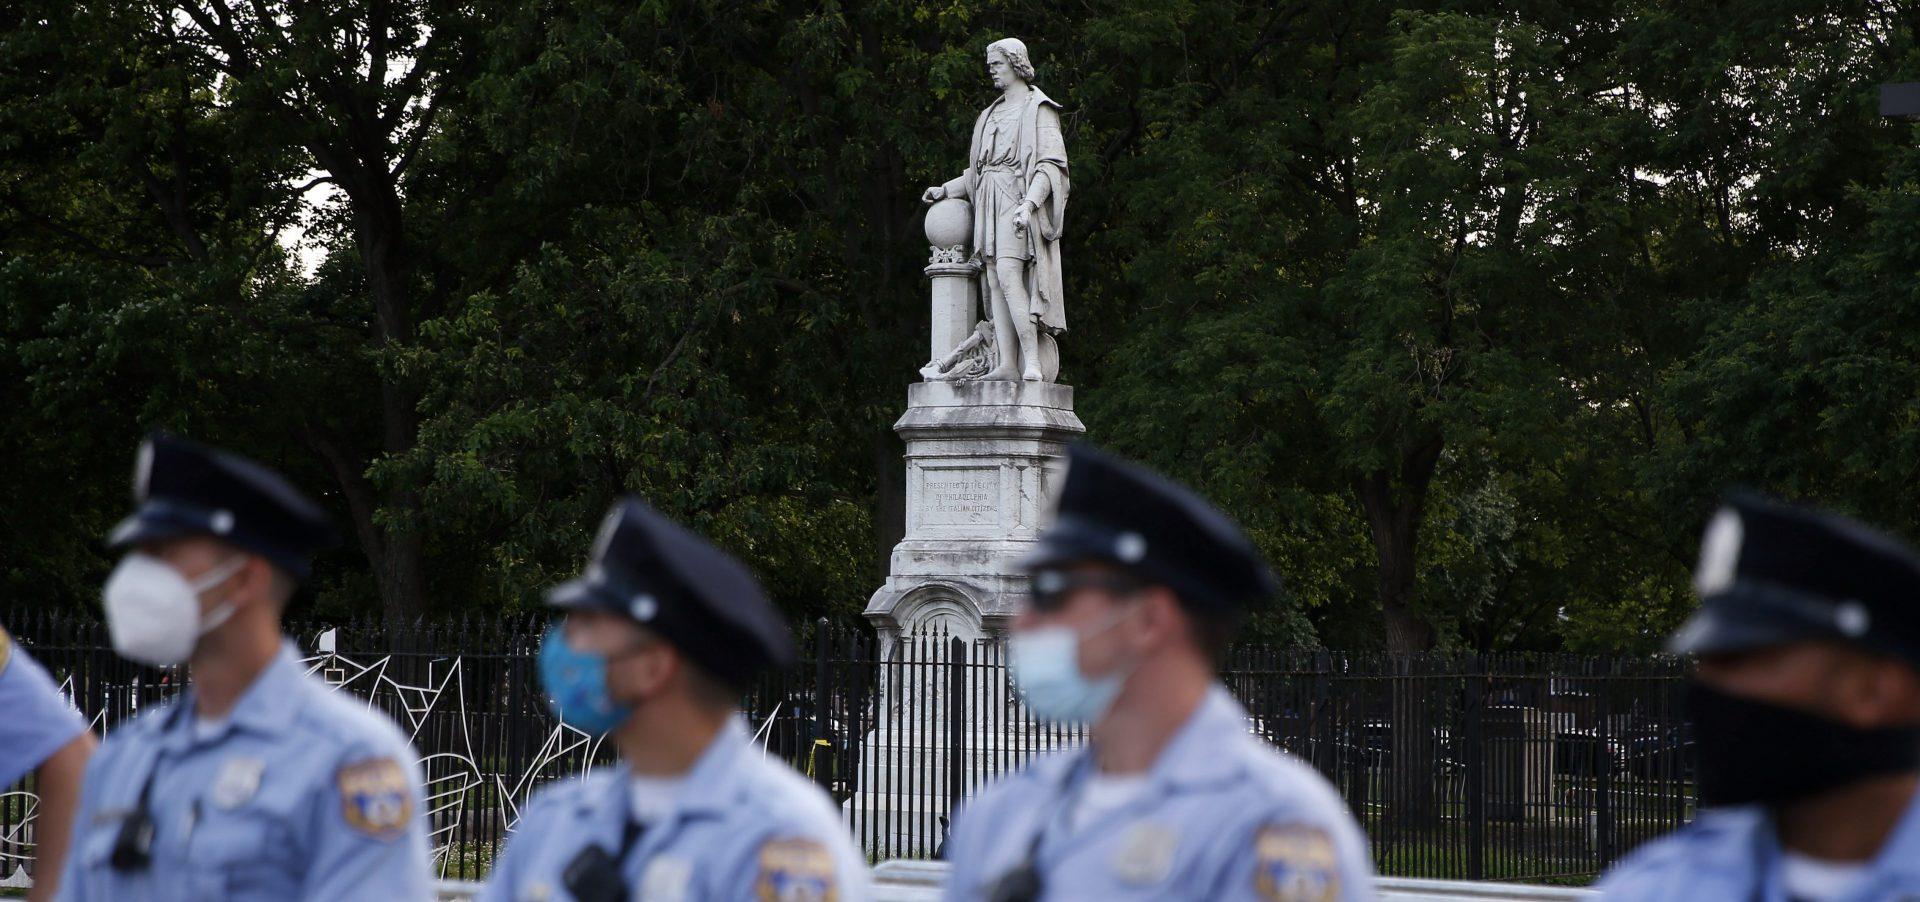 Philadelphia police officers gather near the statue of Christopher Columbus at Marconi Plaza, Monday, June 15, 2020, in the South Philadelphia neighborhood of Philadelphia.